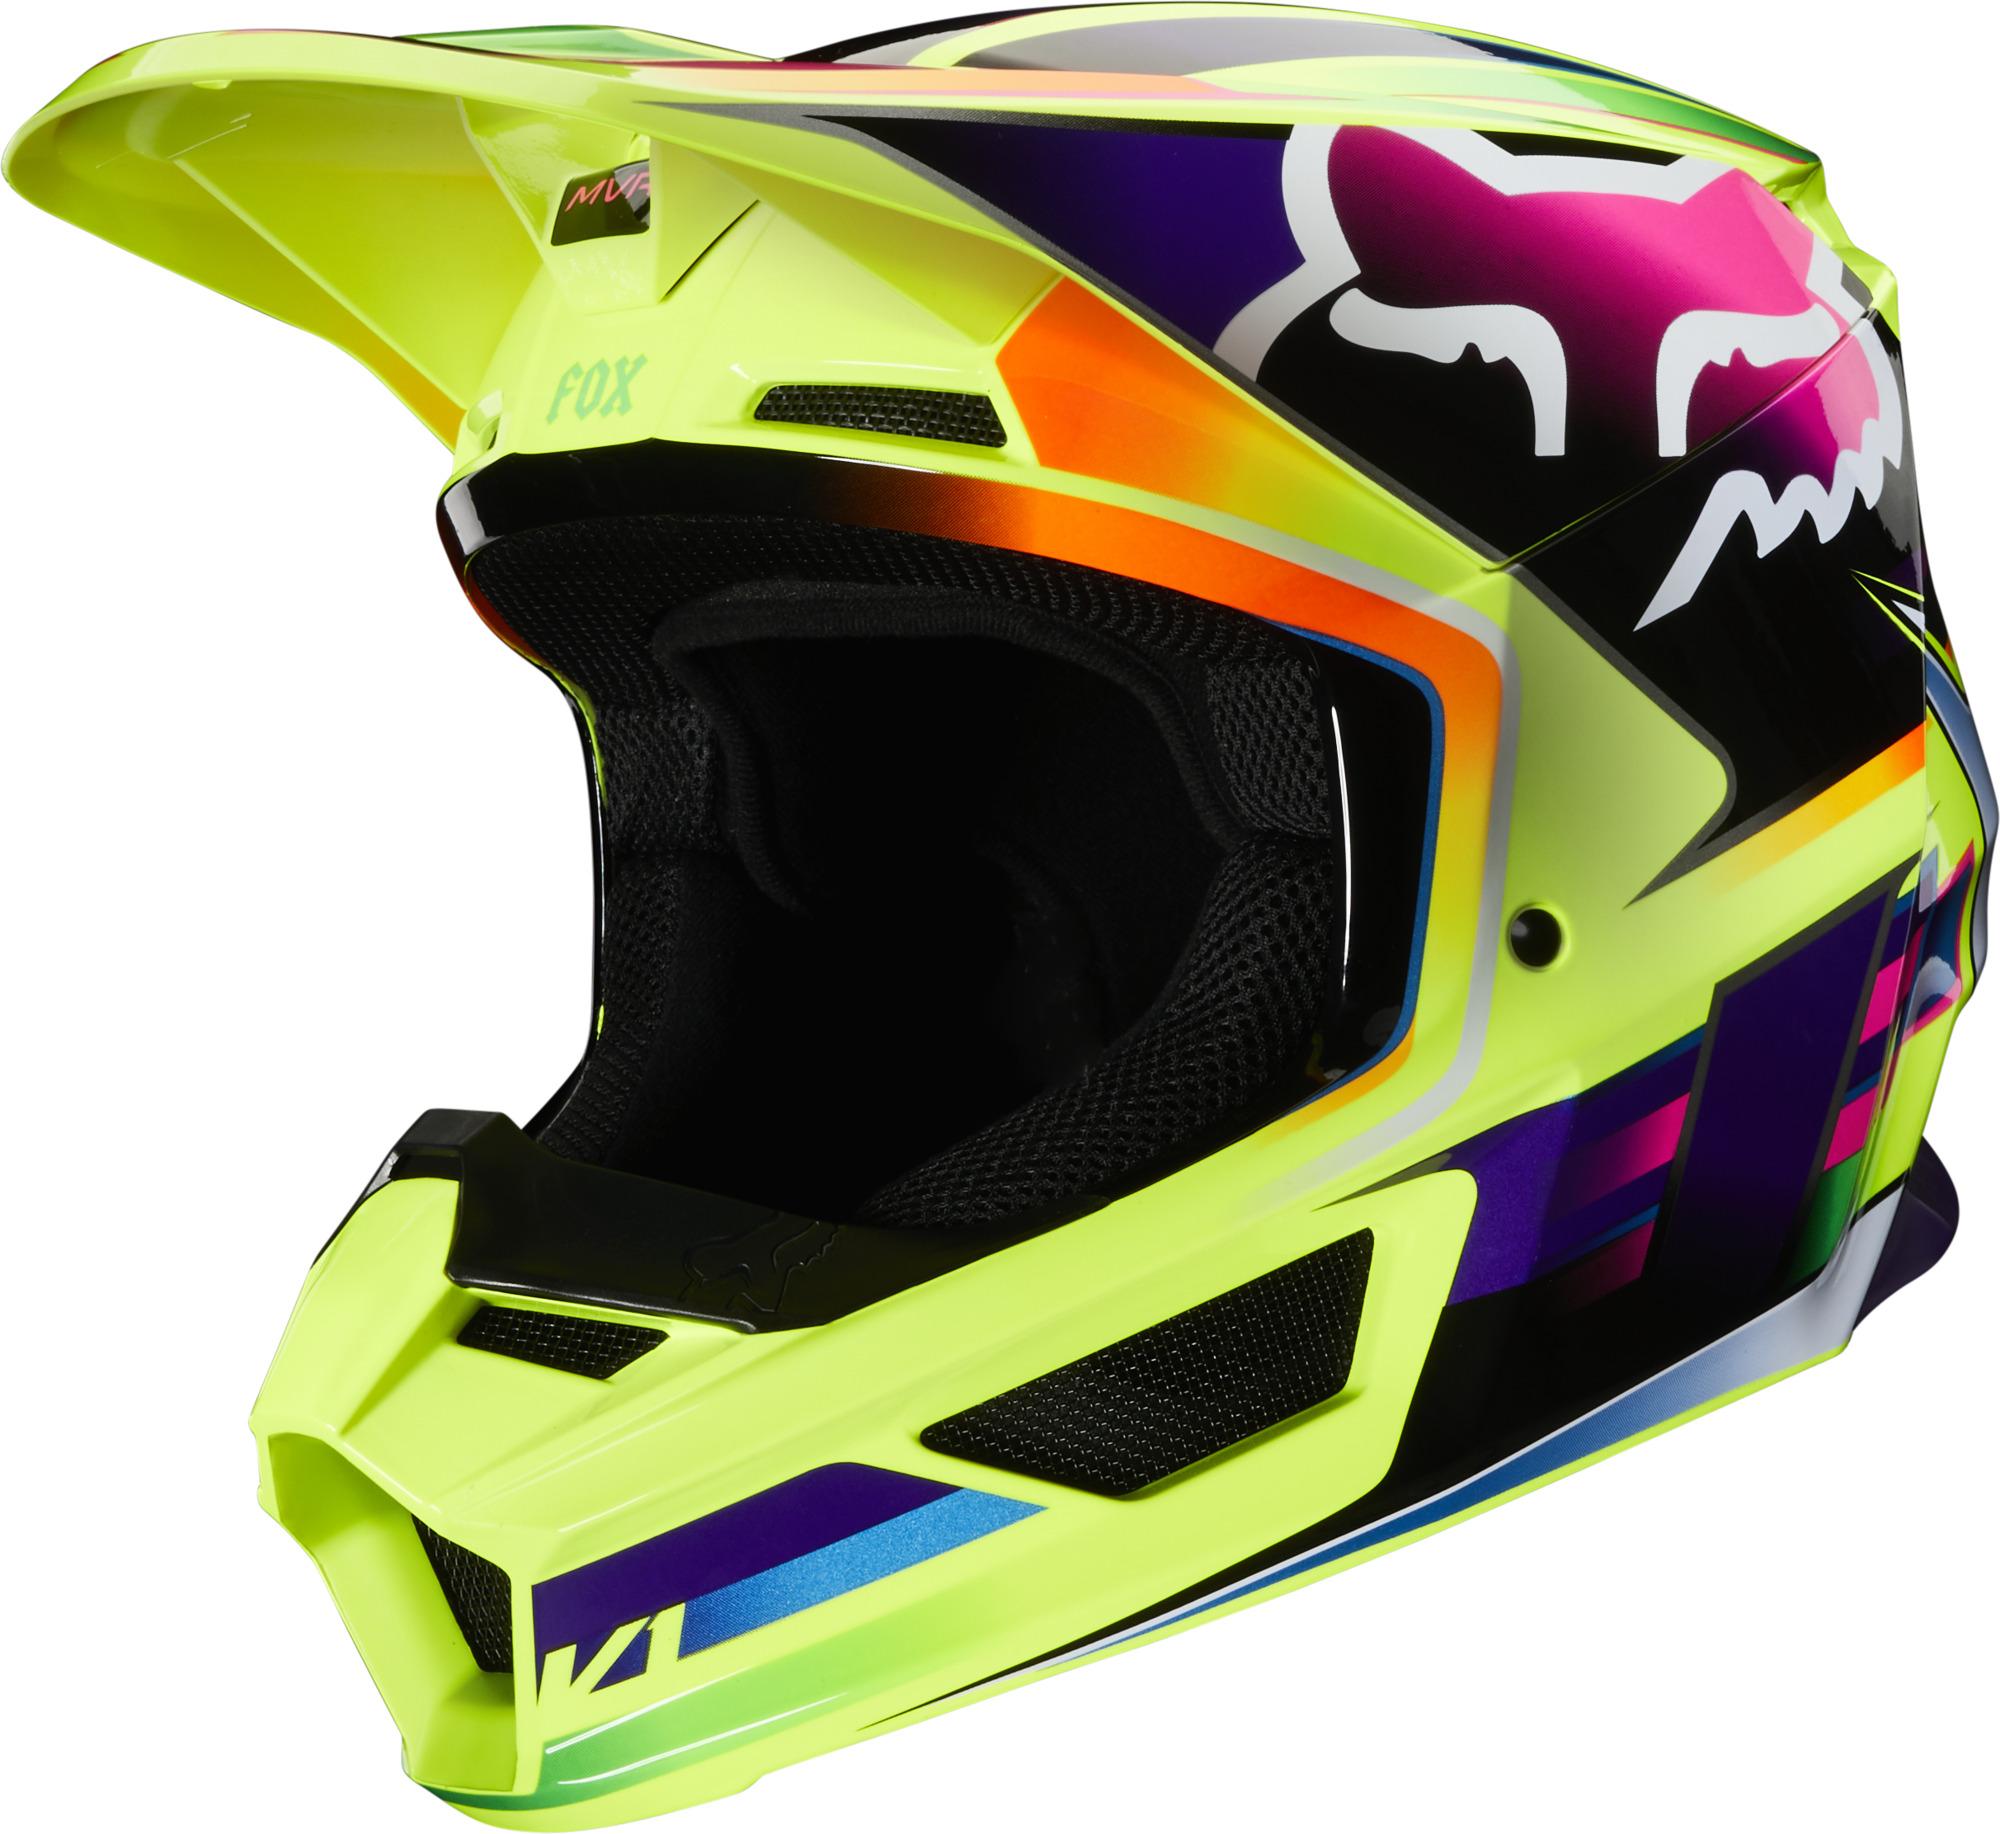 Fox Racing V1 Gama Mx Offroad Helmet Yellow Ebay